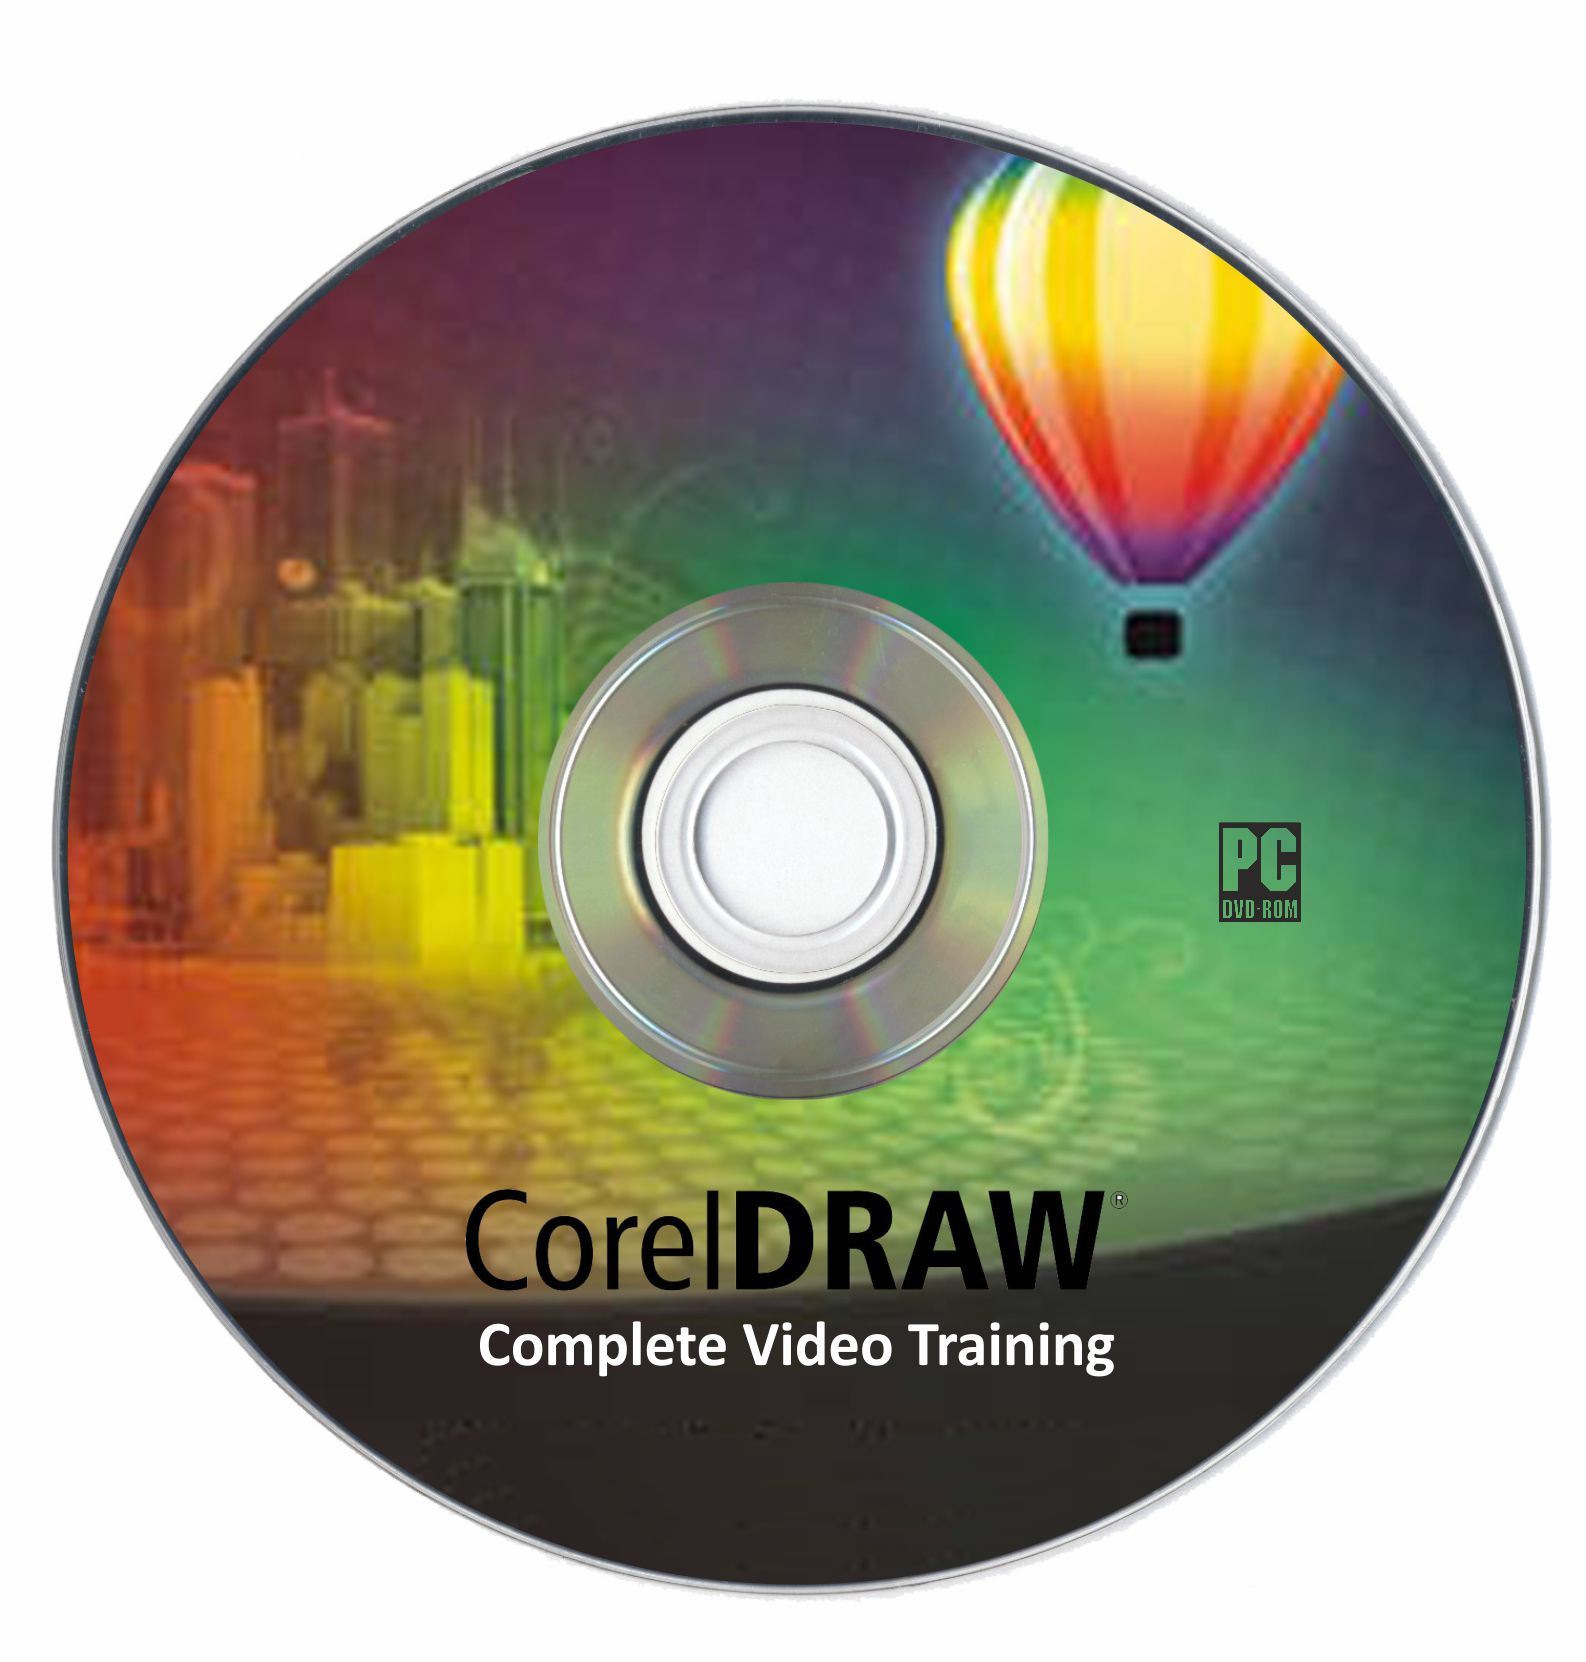 Coreldraw Tutorials Video Training – 1 Dvd Rs 300/- | DigiDVDs